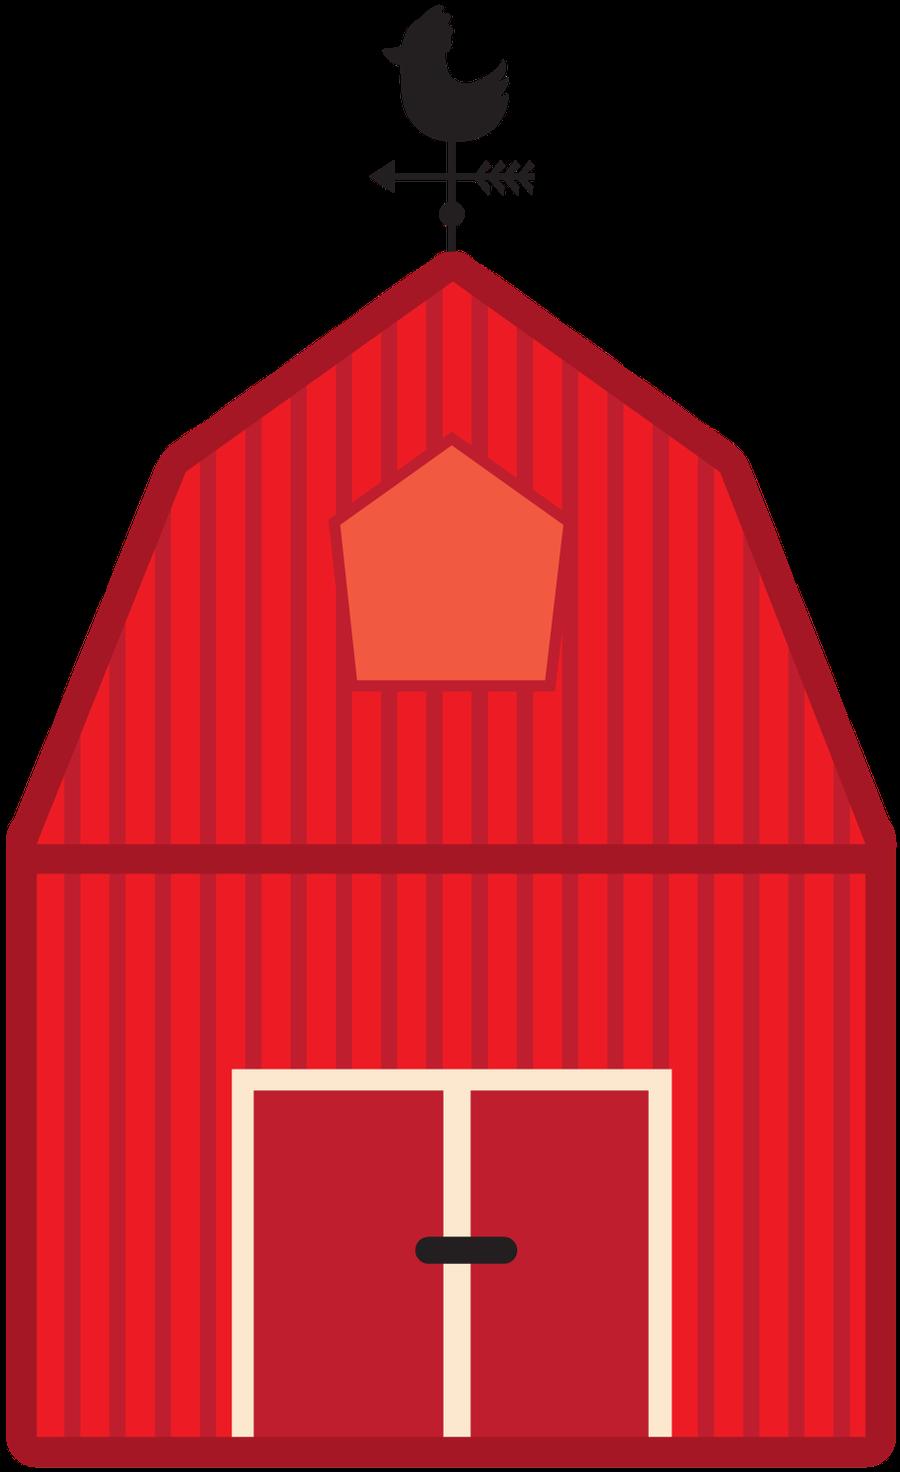 Fazenda minus clip art. Farm clipart hay